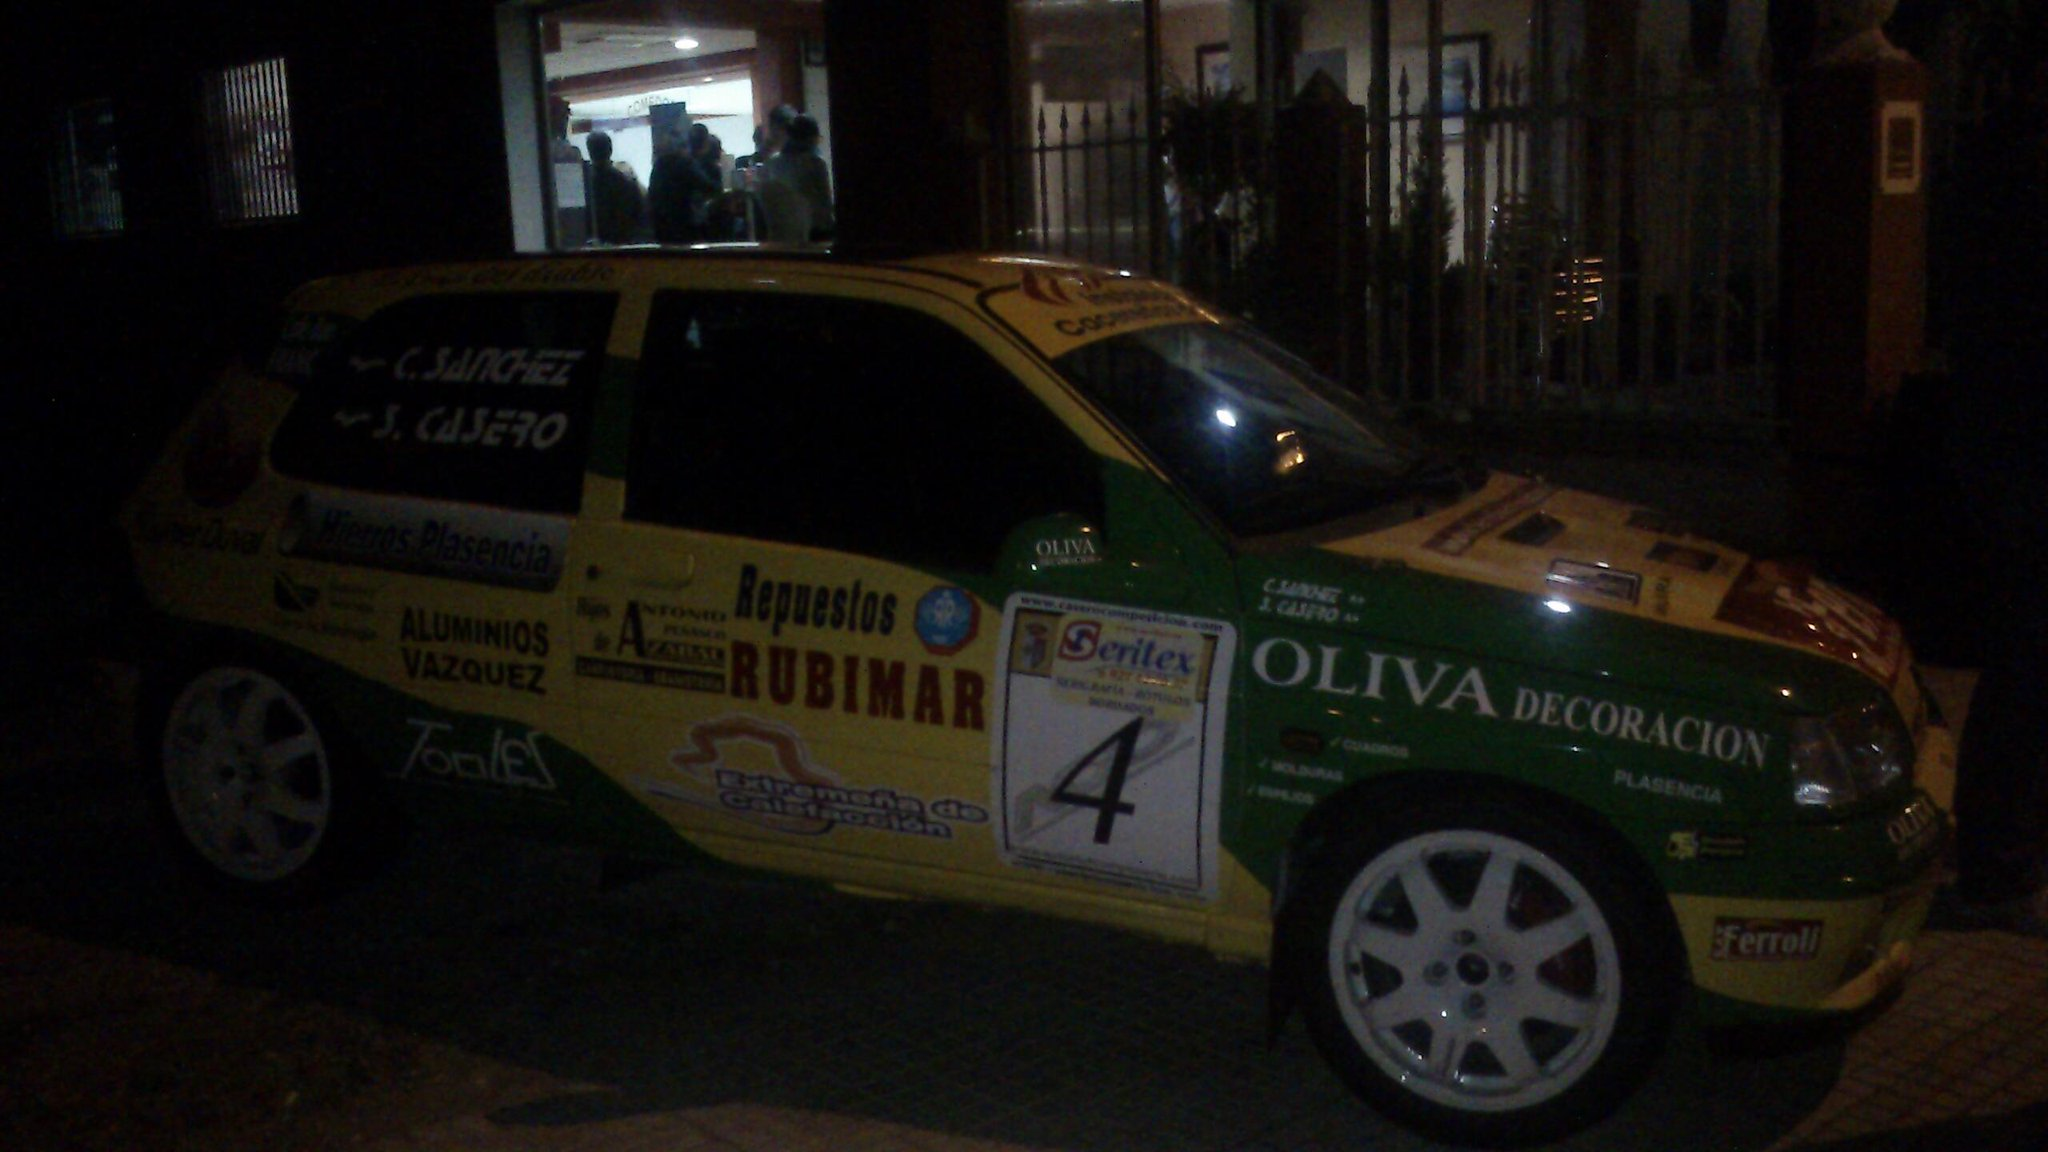 [EXTREMADURA] XXVIII Rallye Norte de Extremadura [26-27 Abril] - Página 5 BIPUF5dCcAEt1Sk